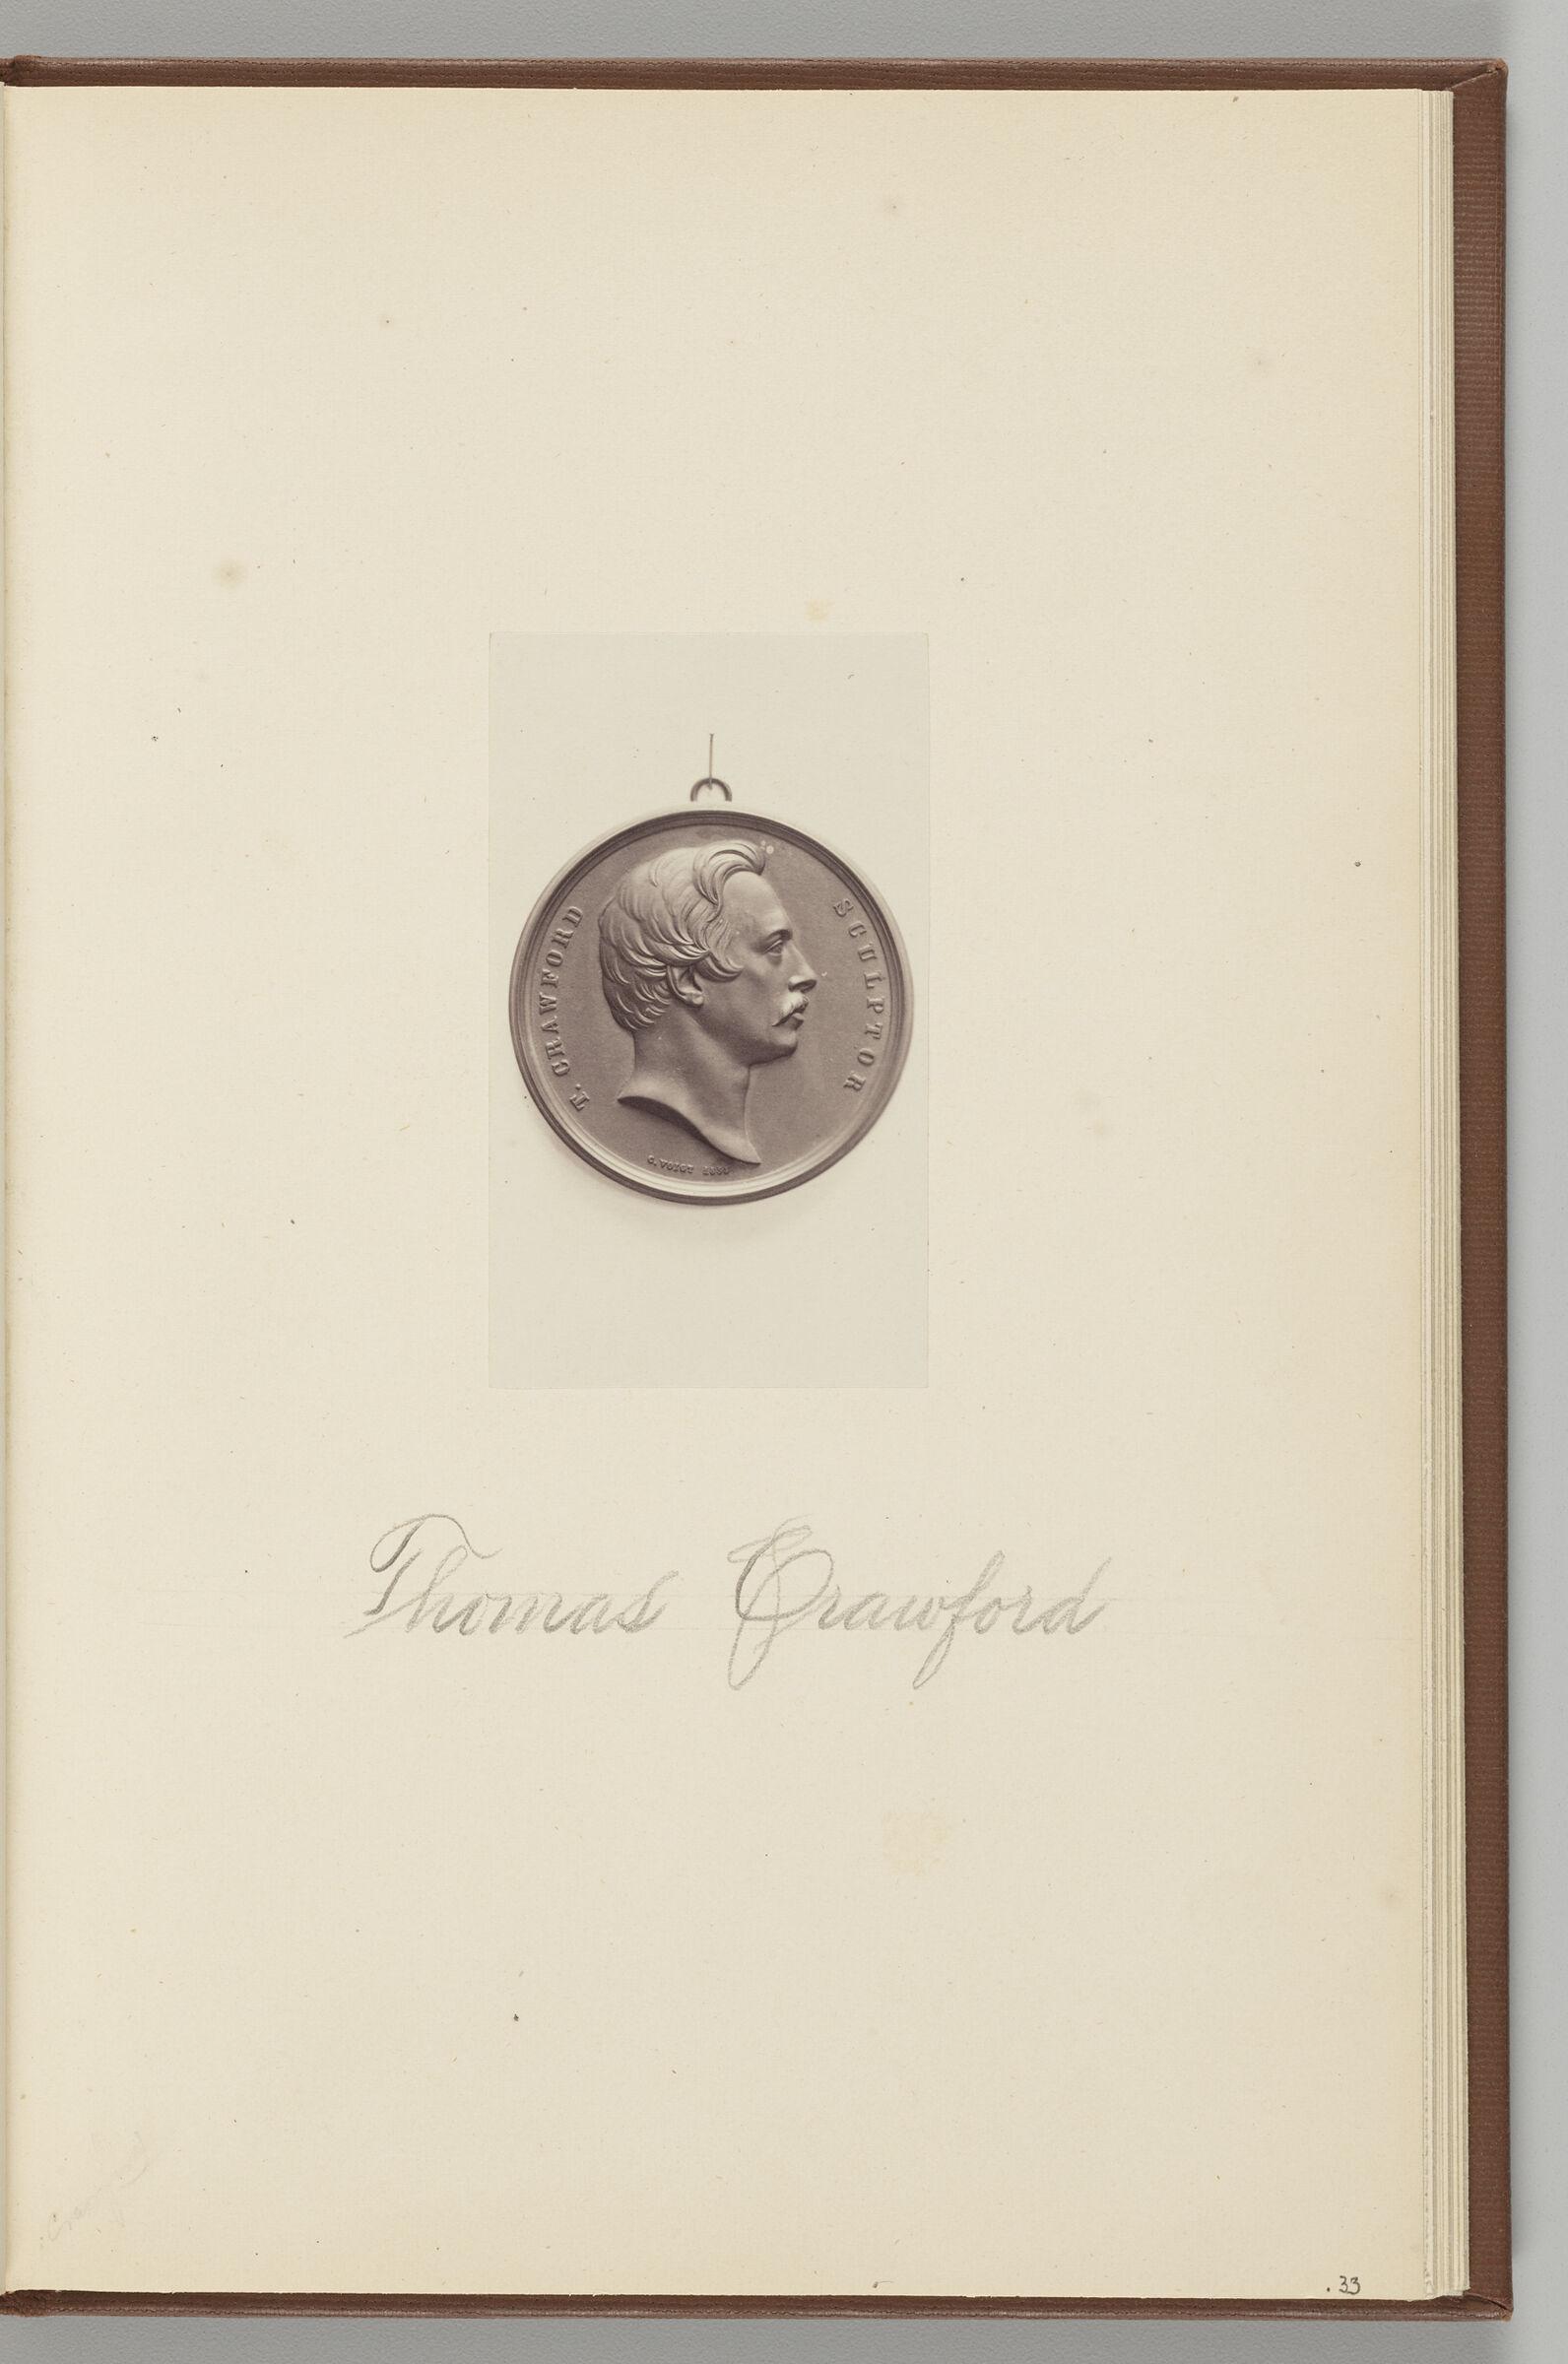 Medal Of Thomas Crawford (1814-1857)